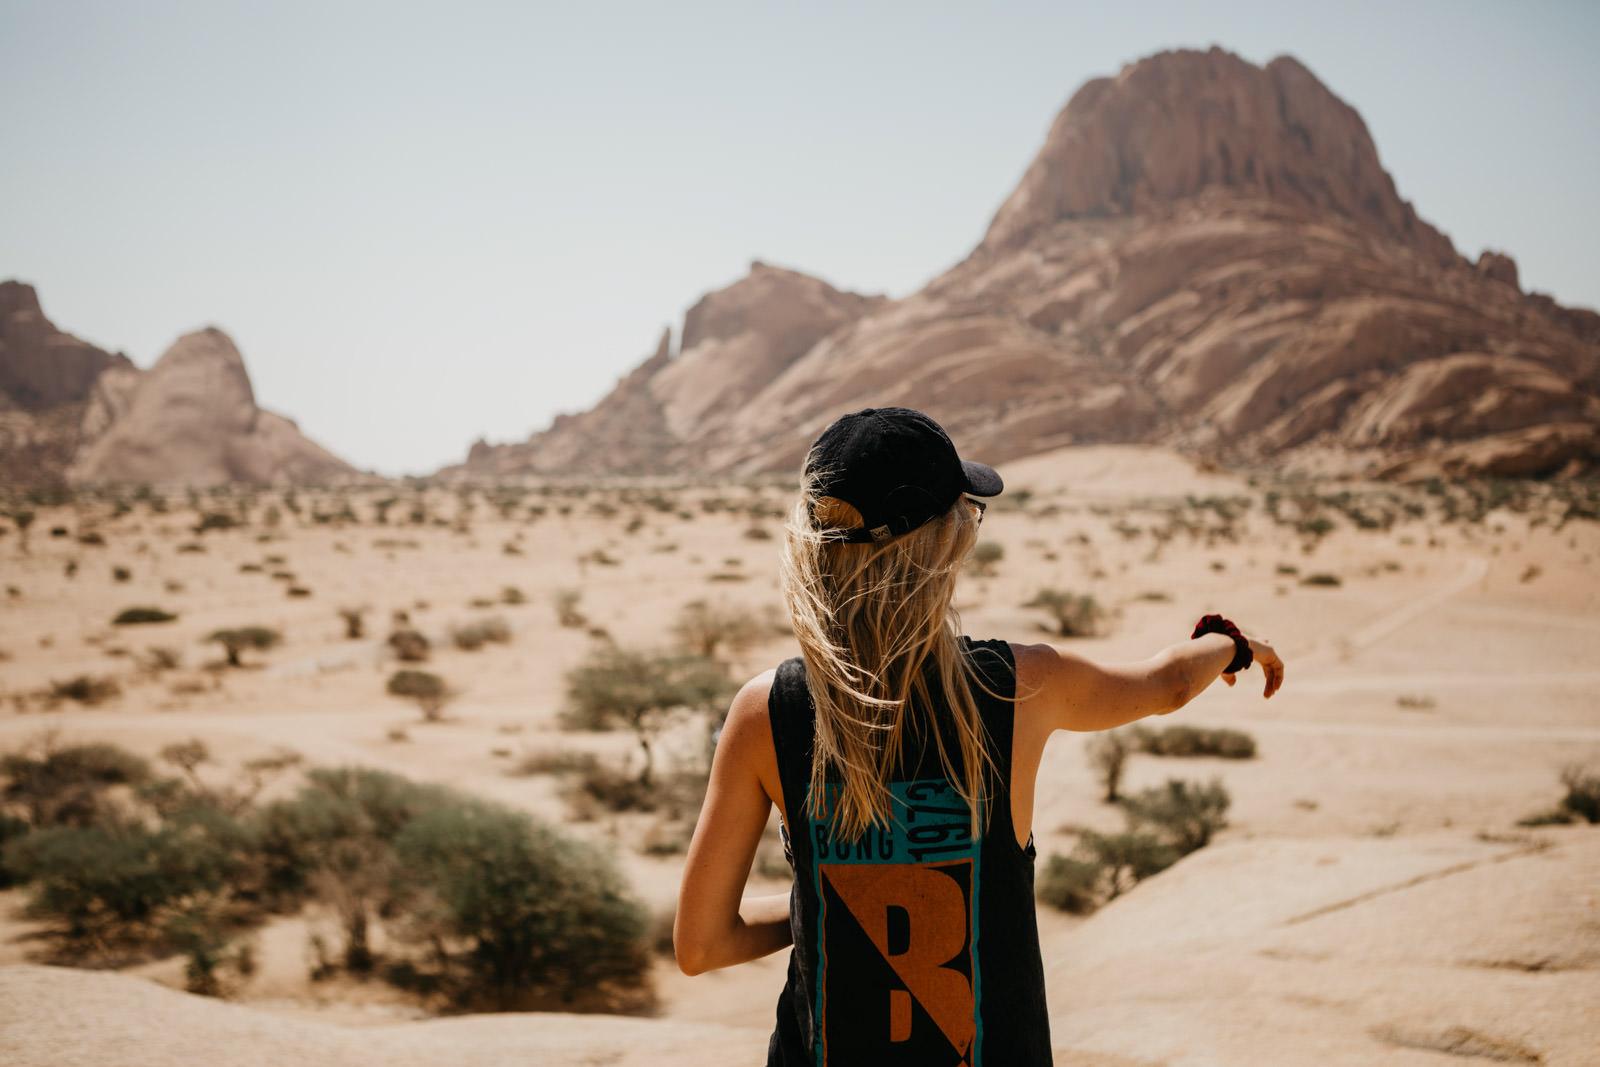 namibia_trip_rooftent_camping_roadtrip (4 von 18).jpg